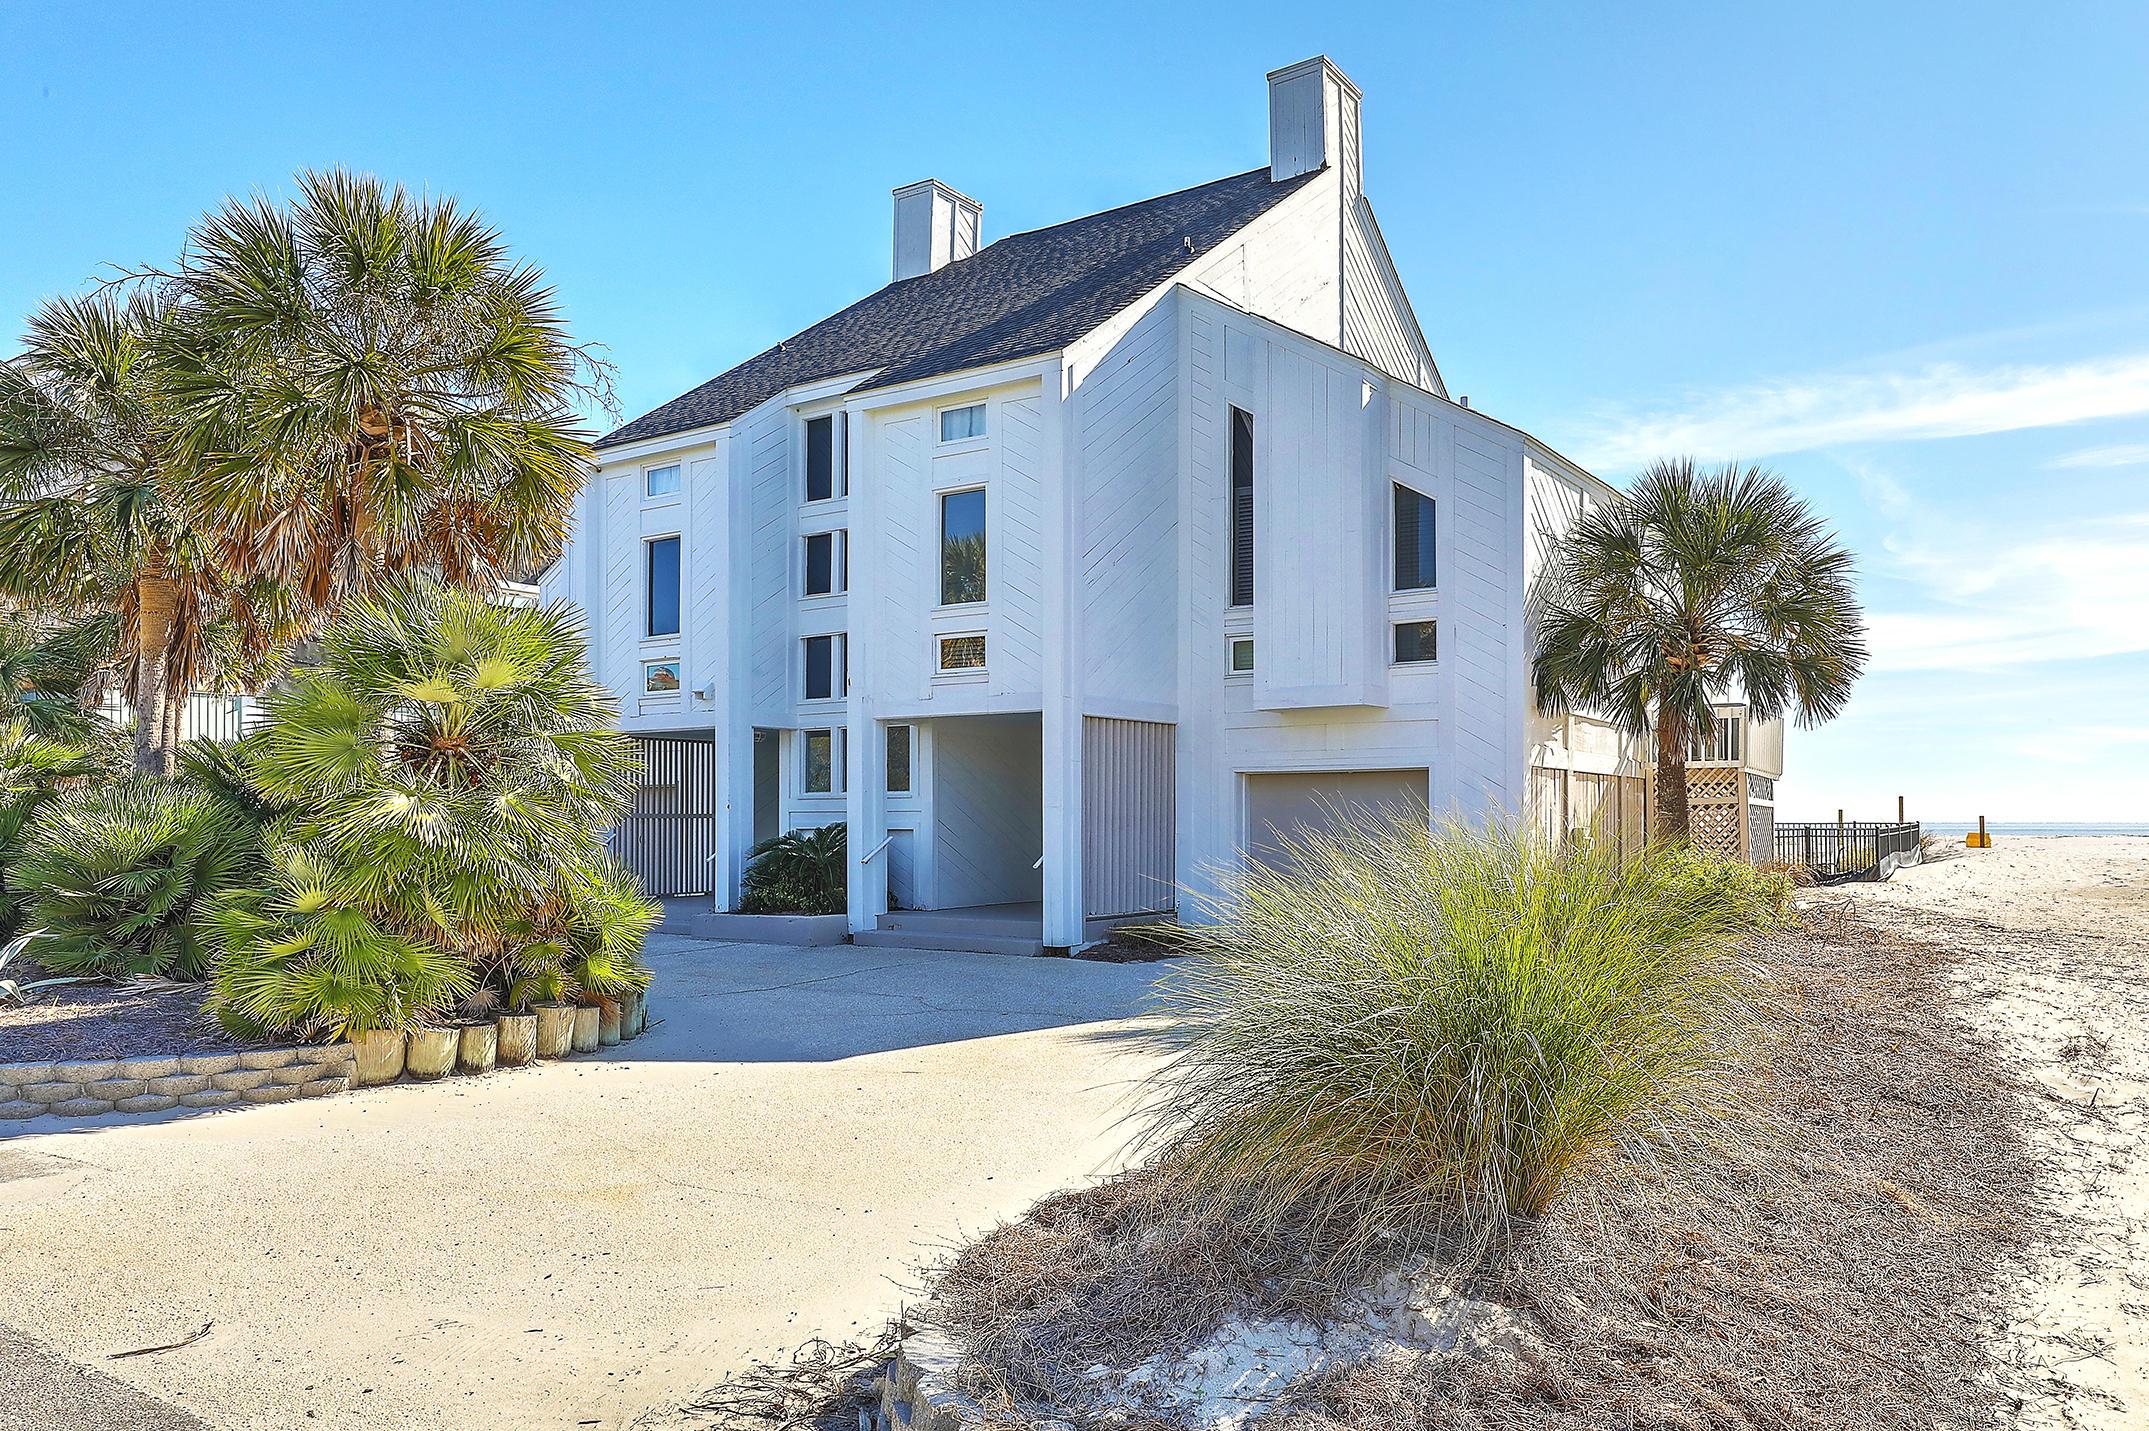 Wild Dunes Homes For Sale - 14 Beachwood East, Isle of Palms, SC - 2